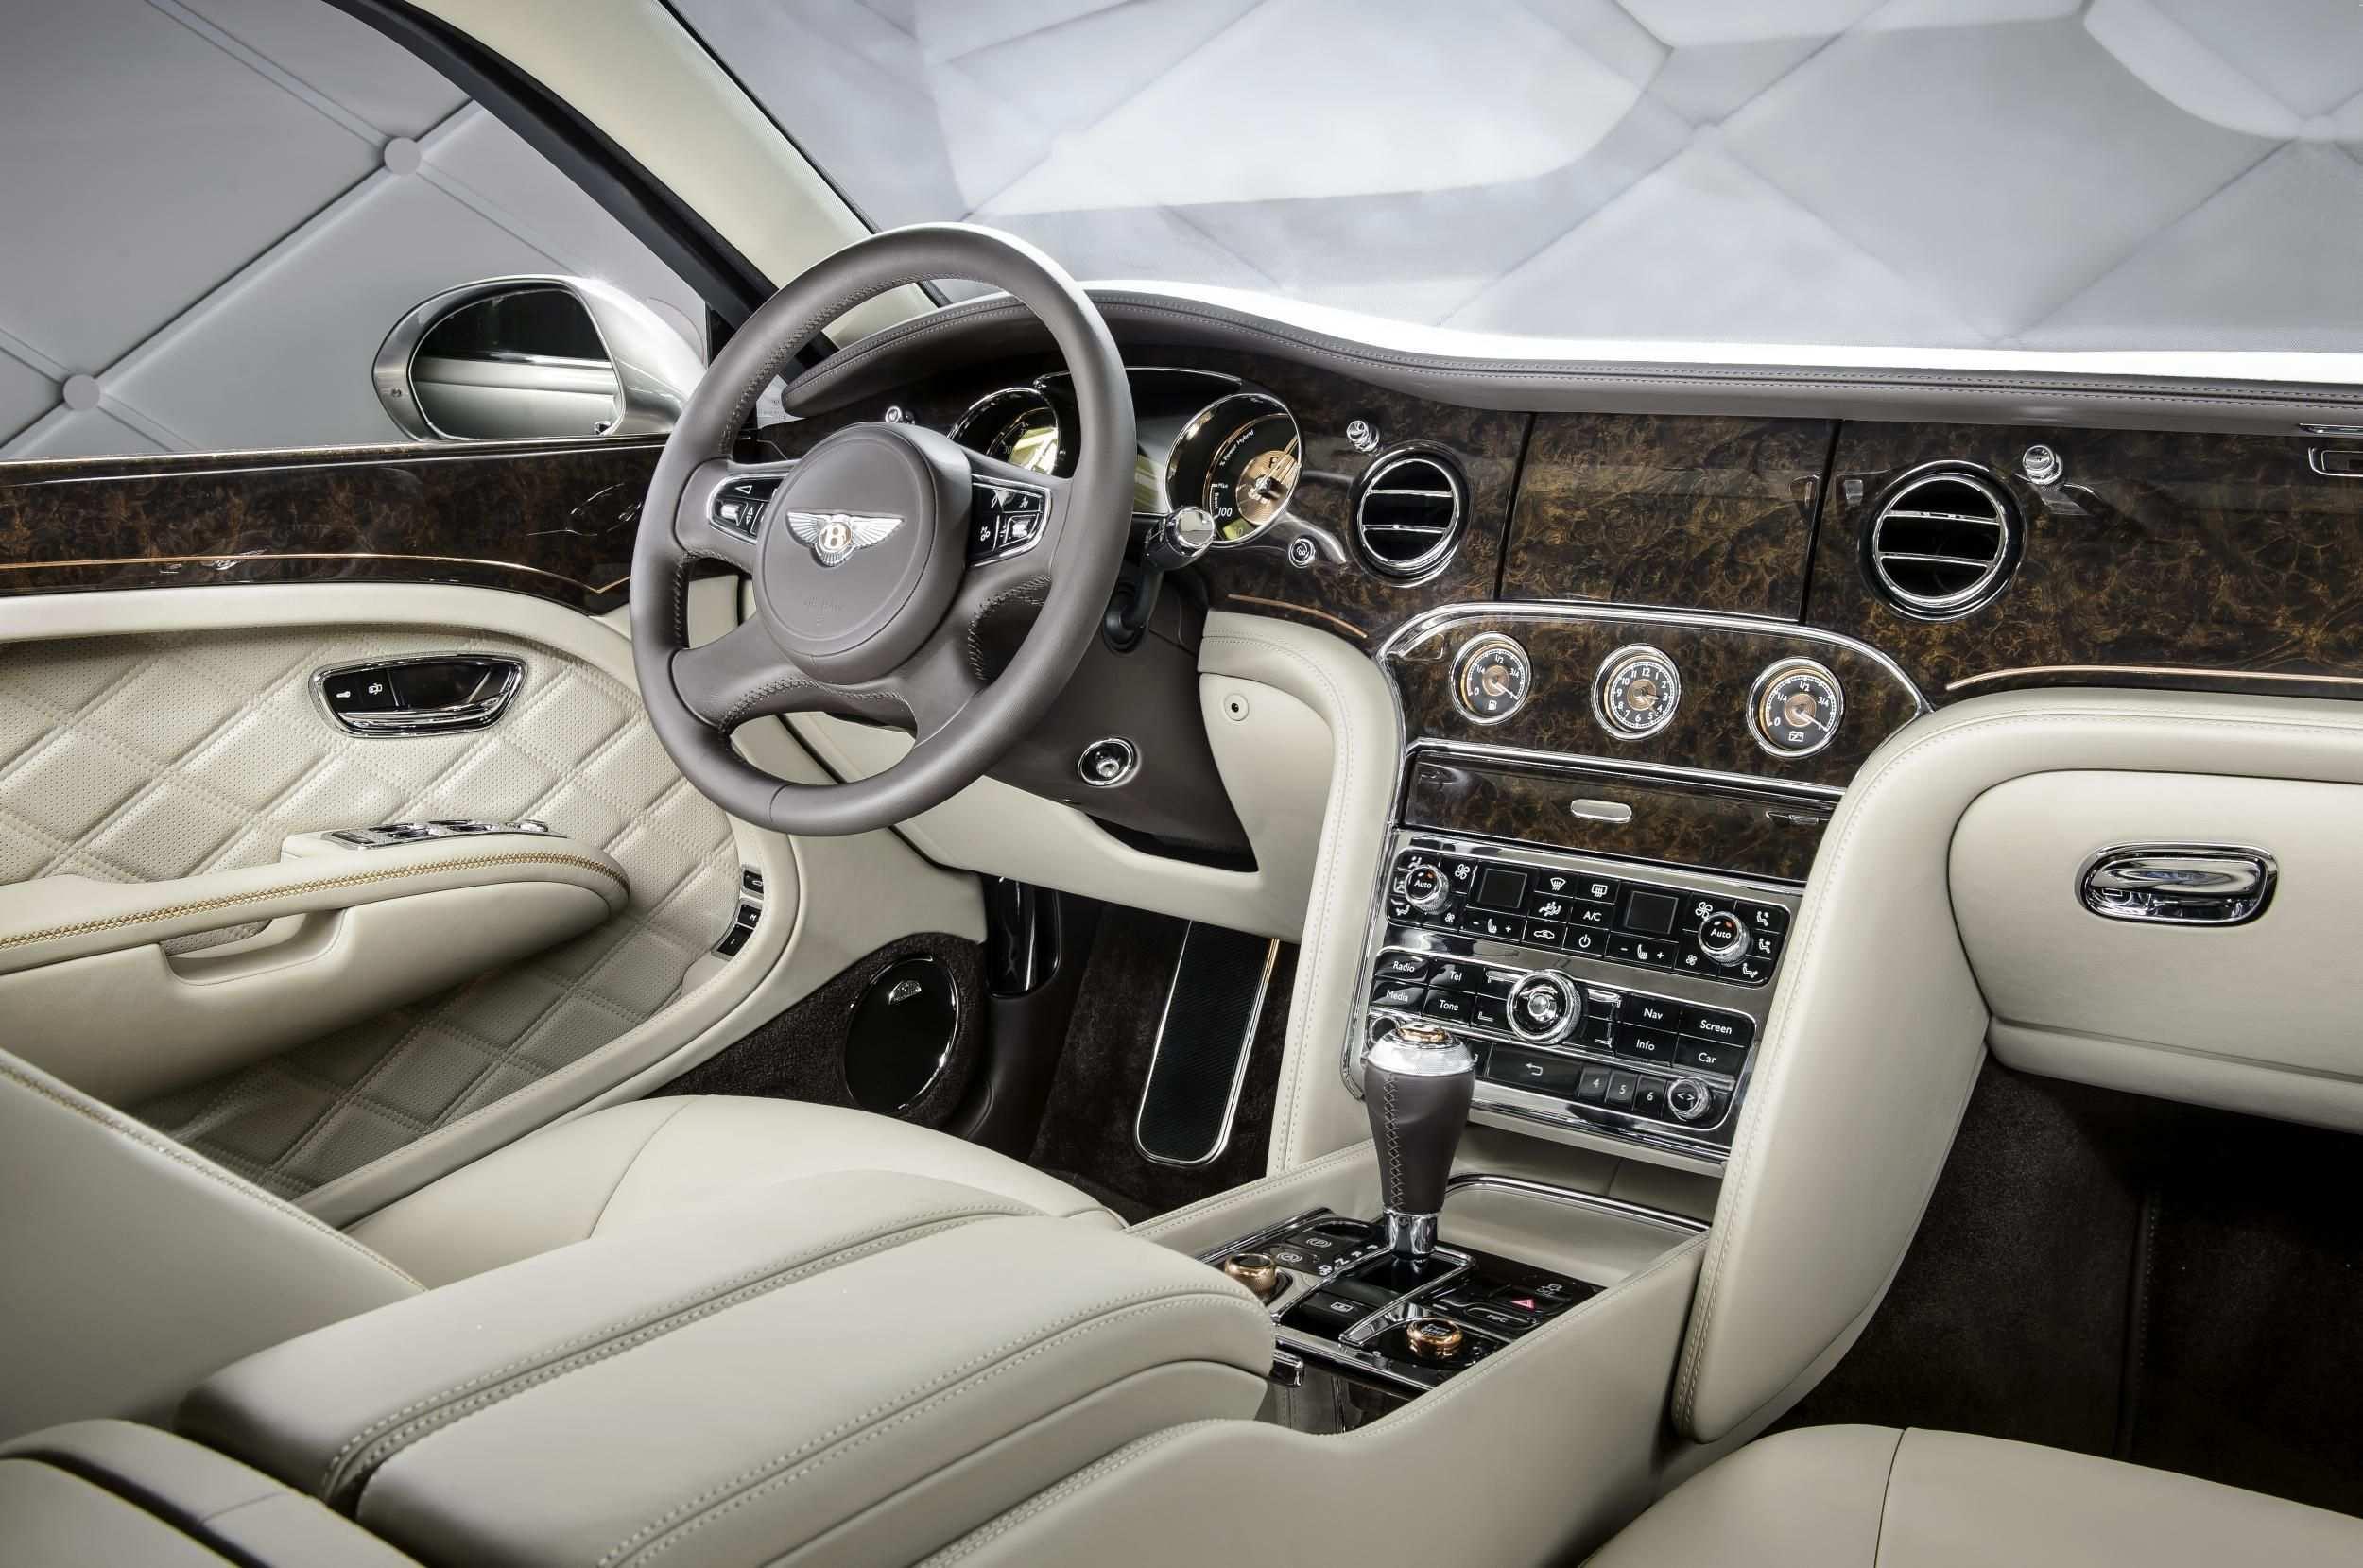 39 New 2020 Bentley Suv Specs with 2020 Bentley Suv